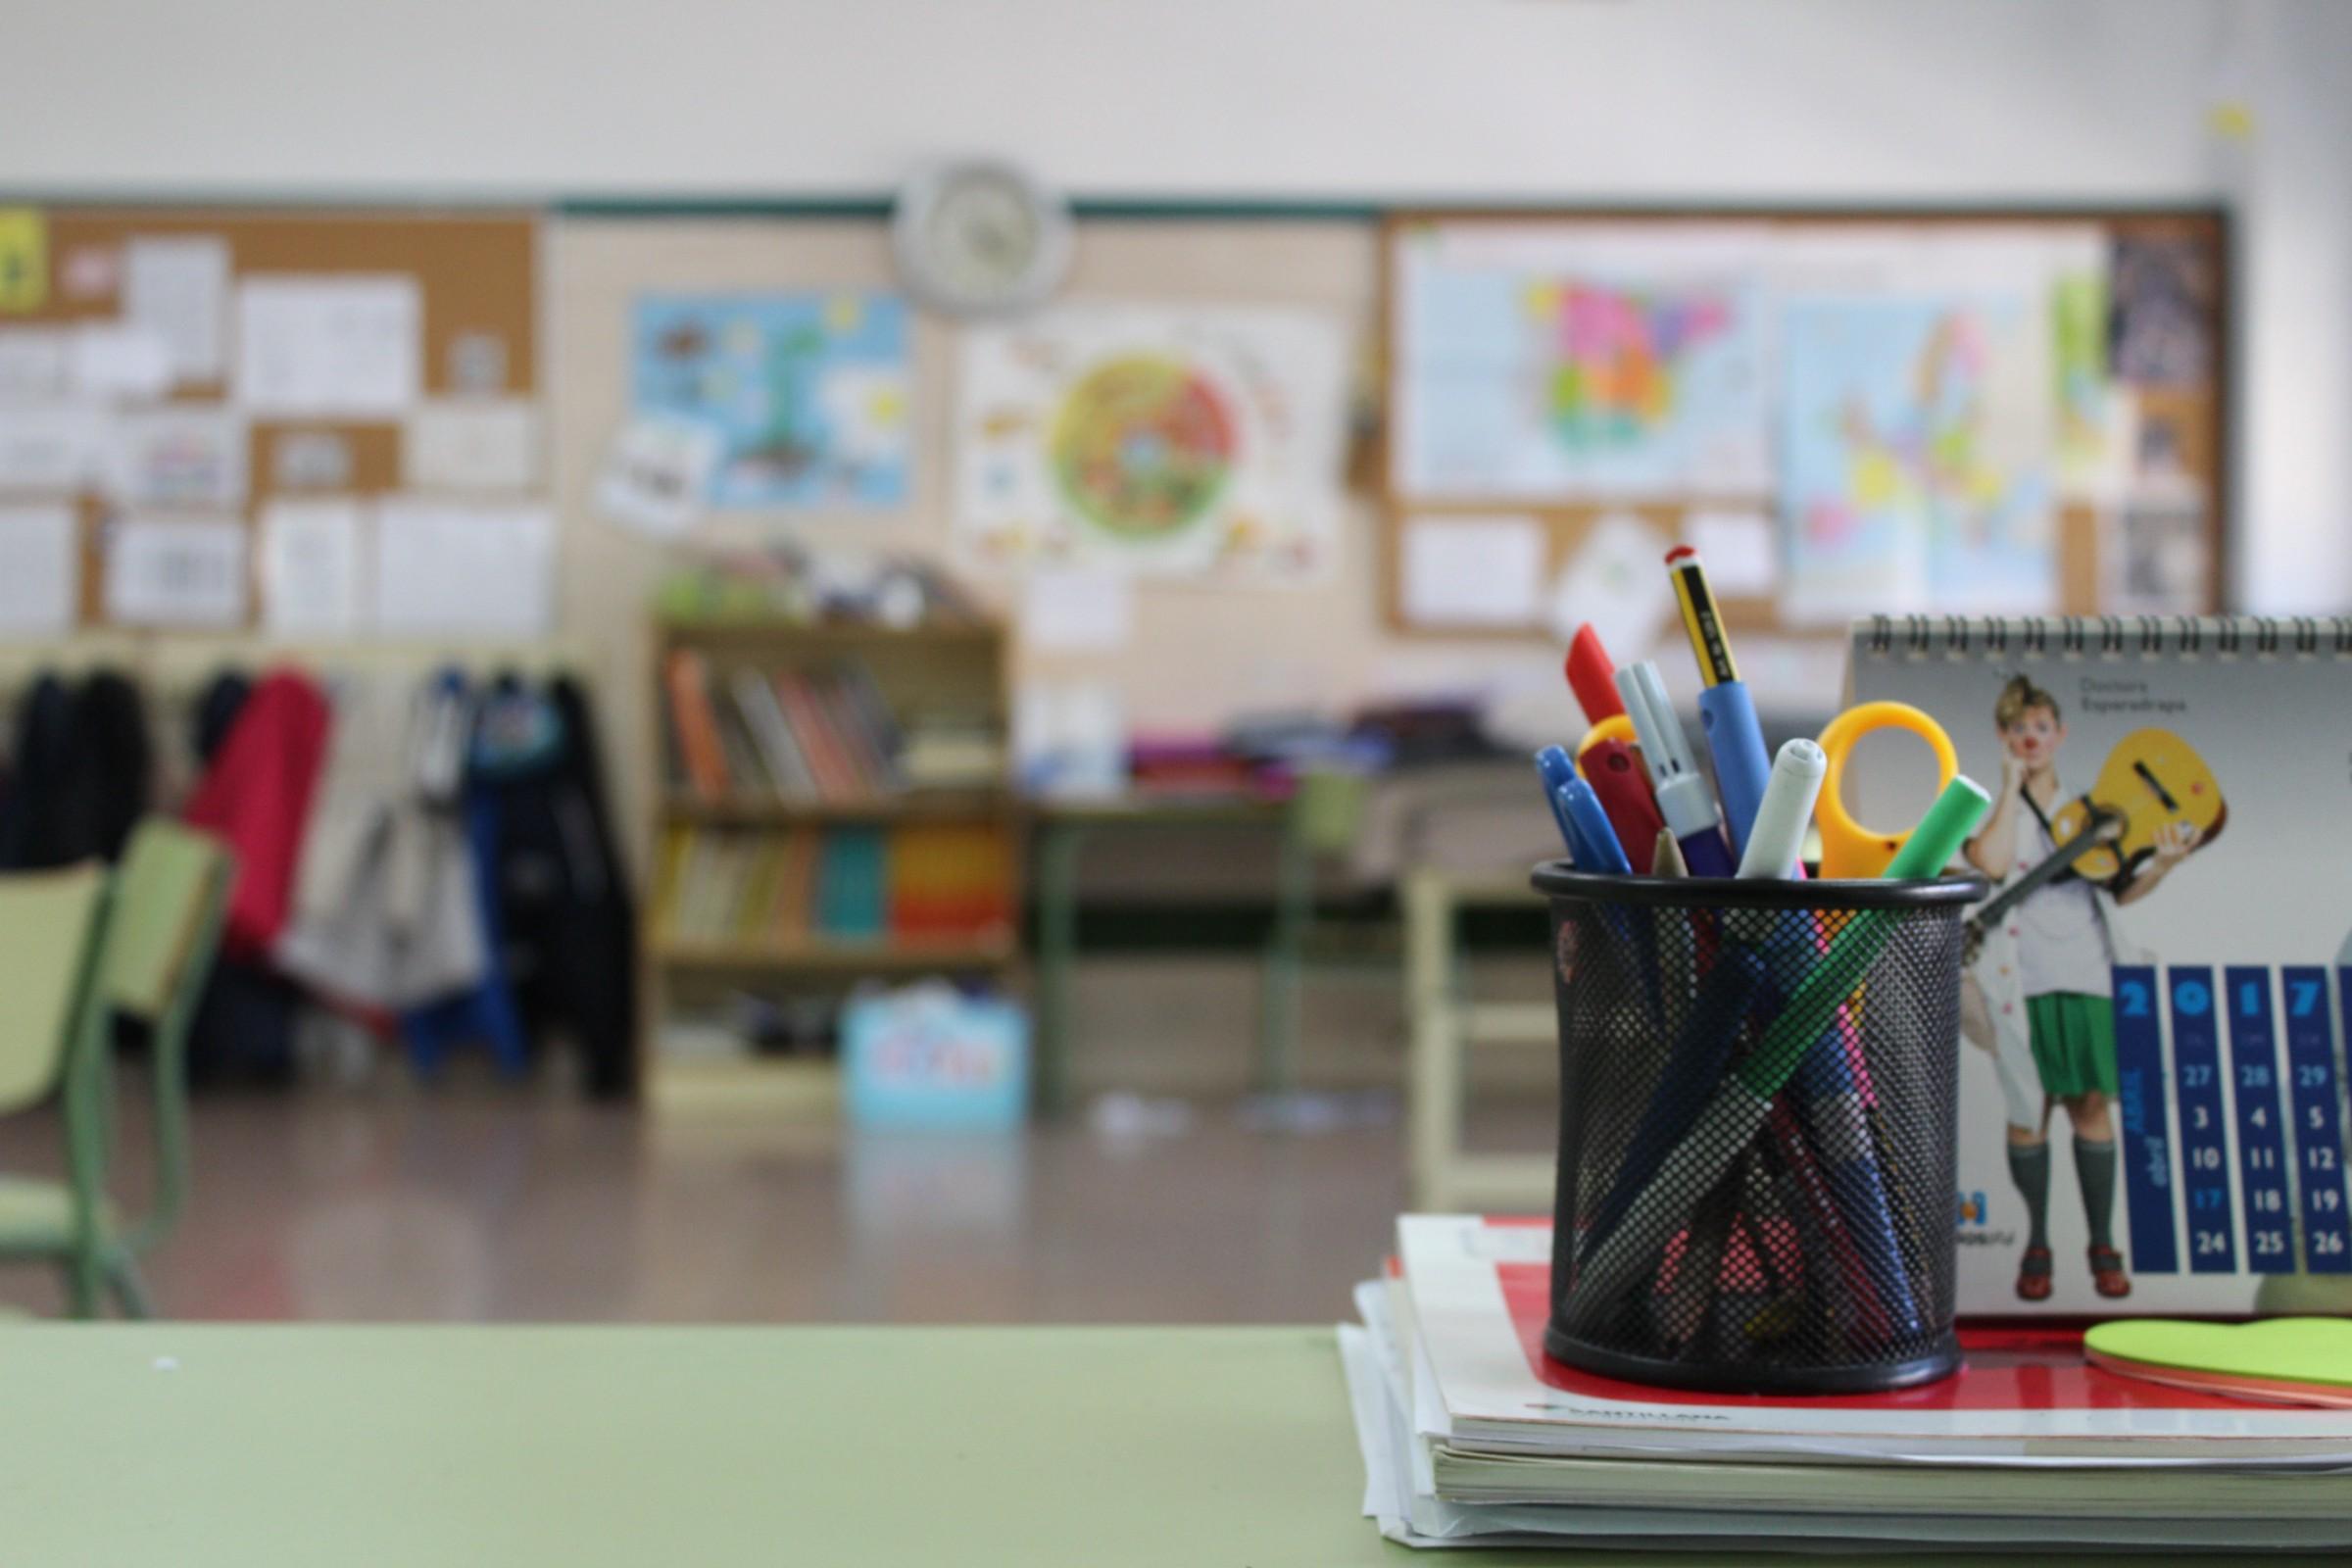 /open-source-in-schools-pros-cons-ec930ce8689d feature image